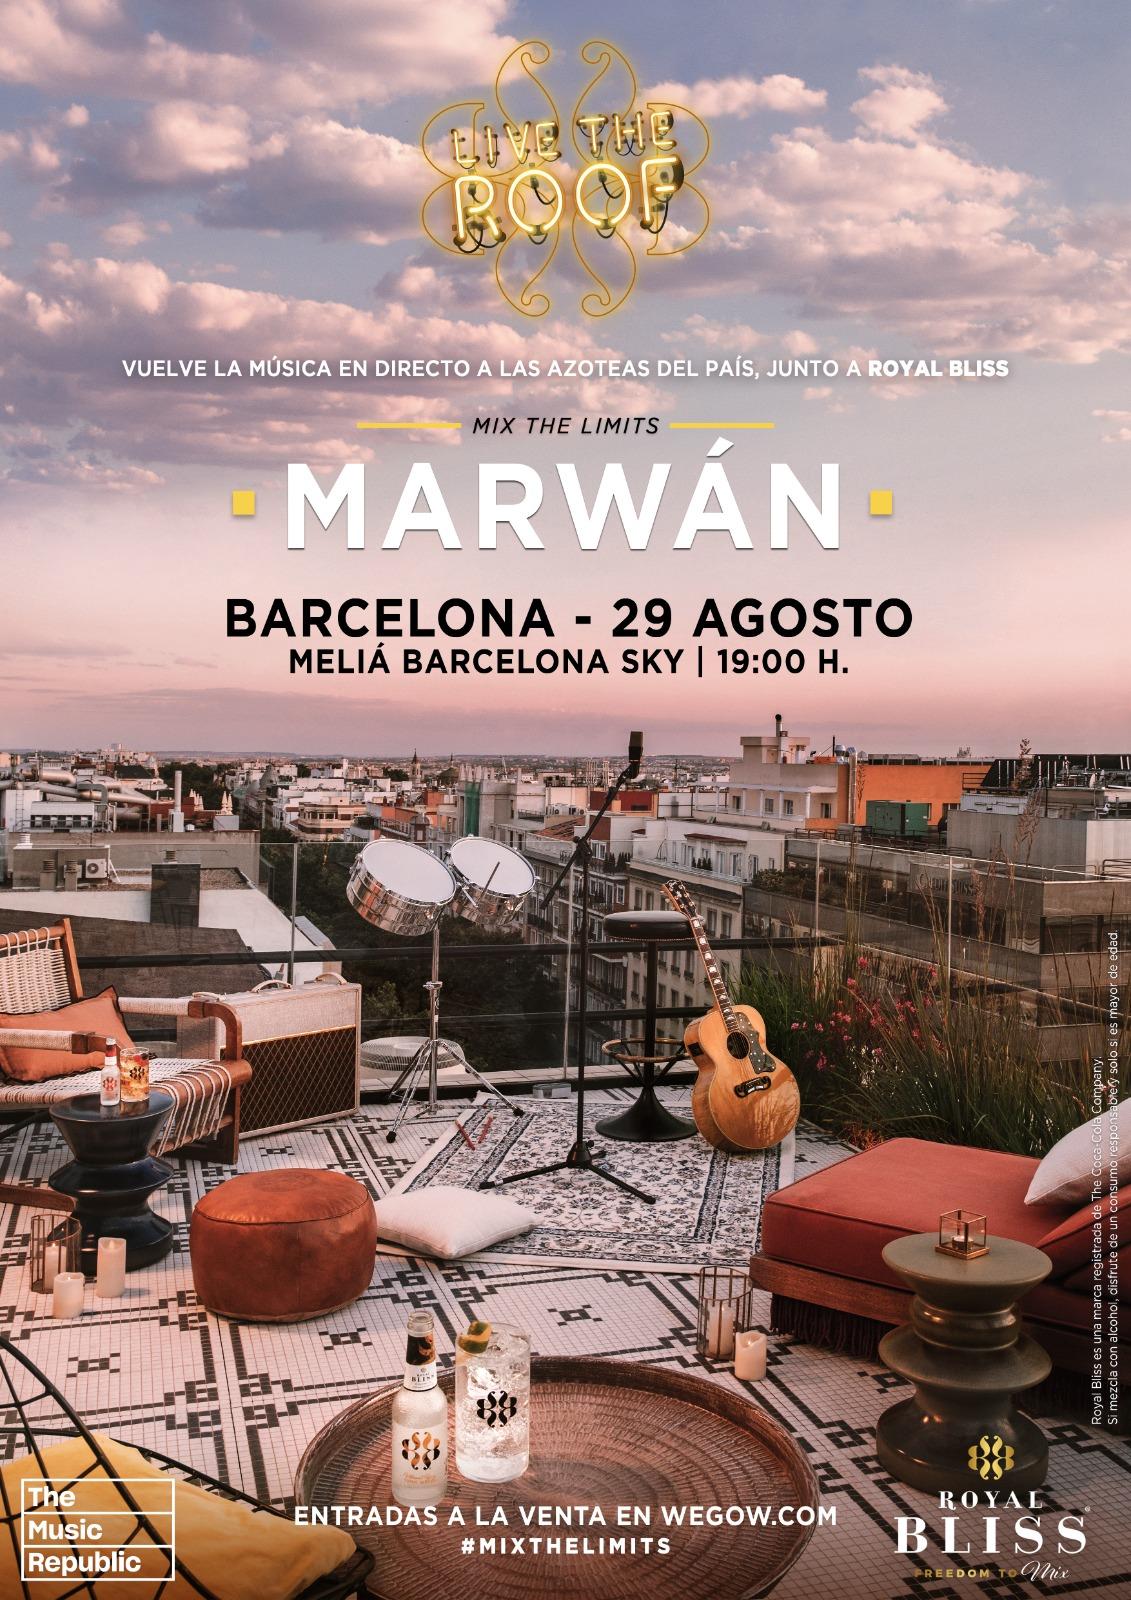 marwan en live the roof barcelona 16238341292052317